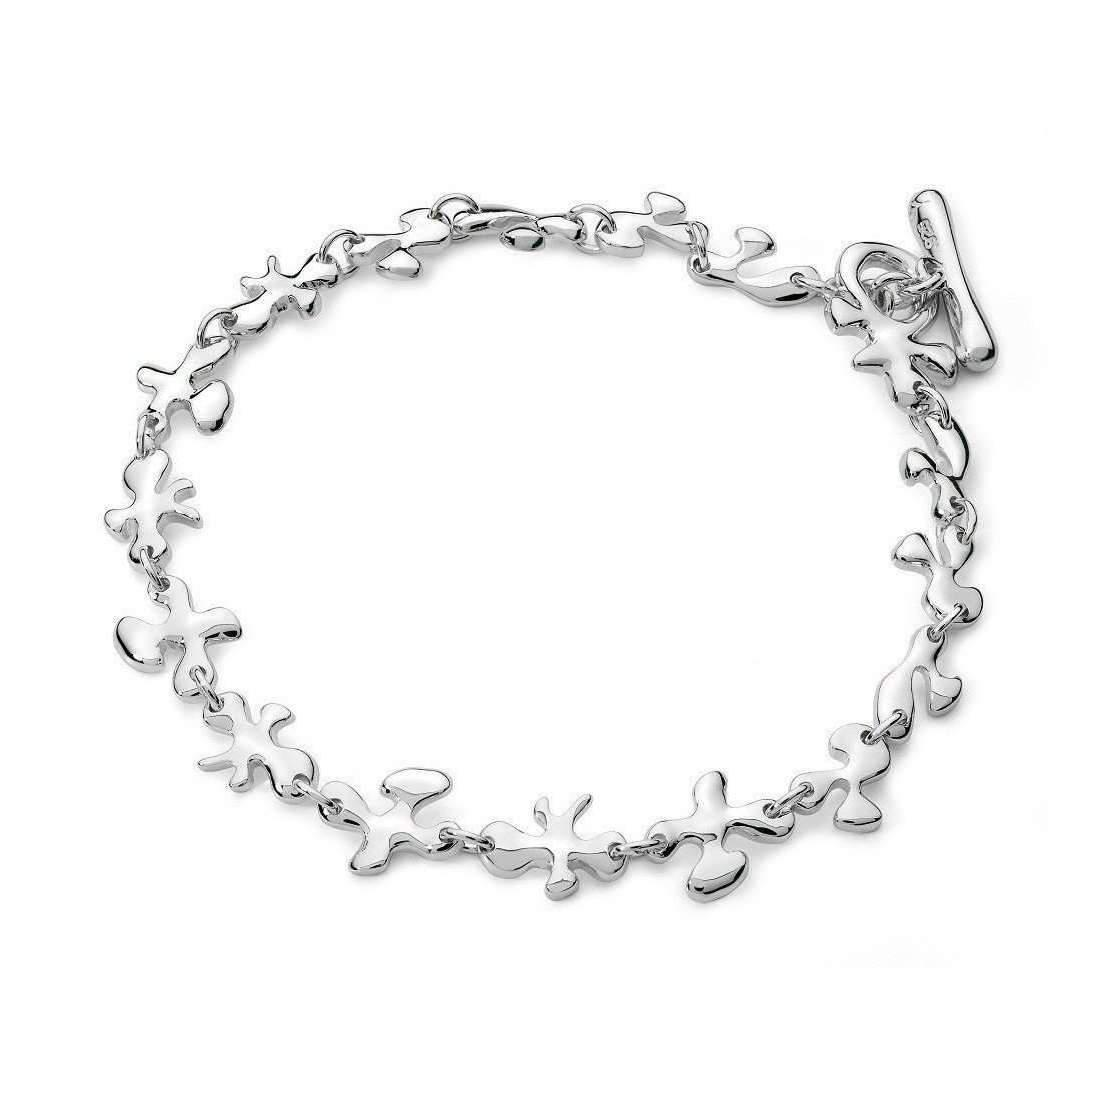 Lucy Quartermaine Eternal Drop Bracelet wlrUA4JbeZ